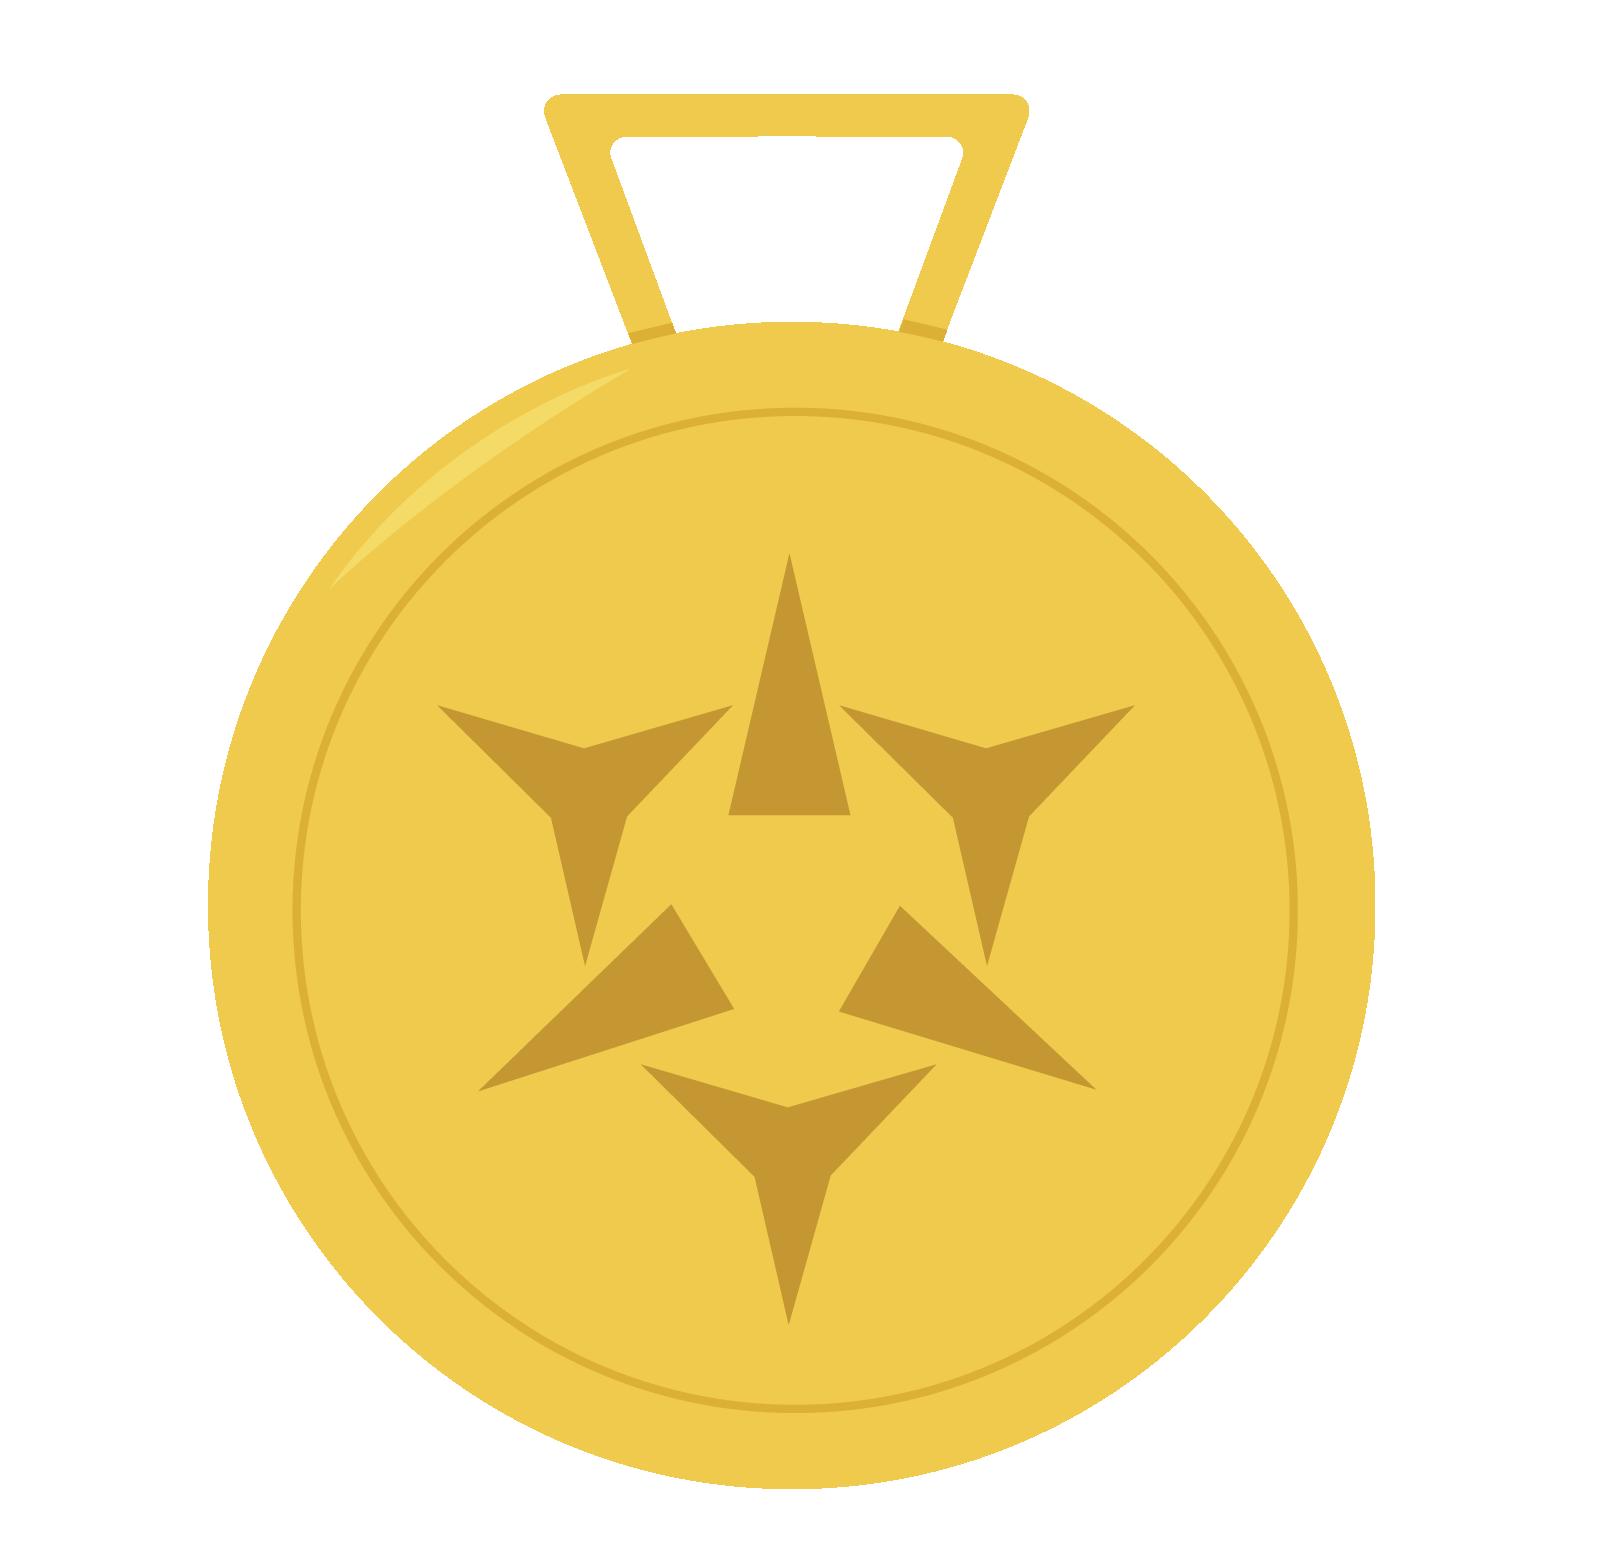 Prix d'honneur logo